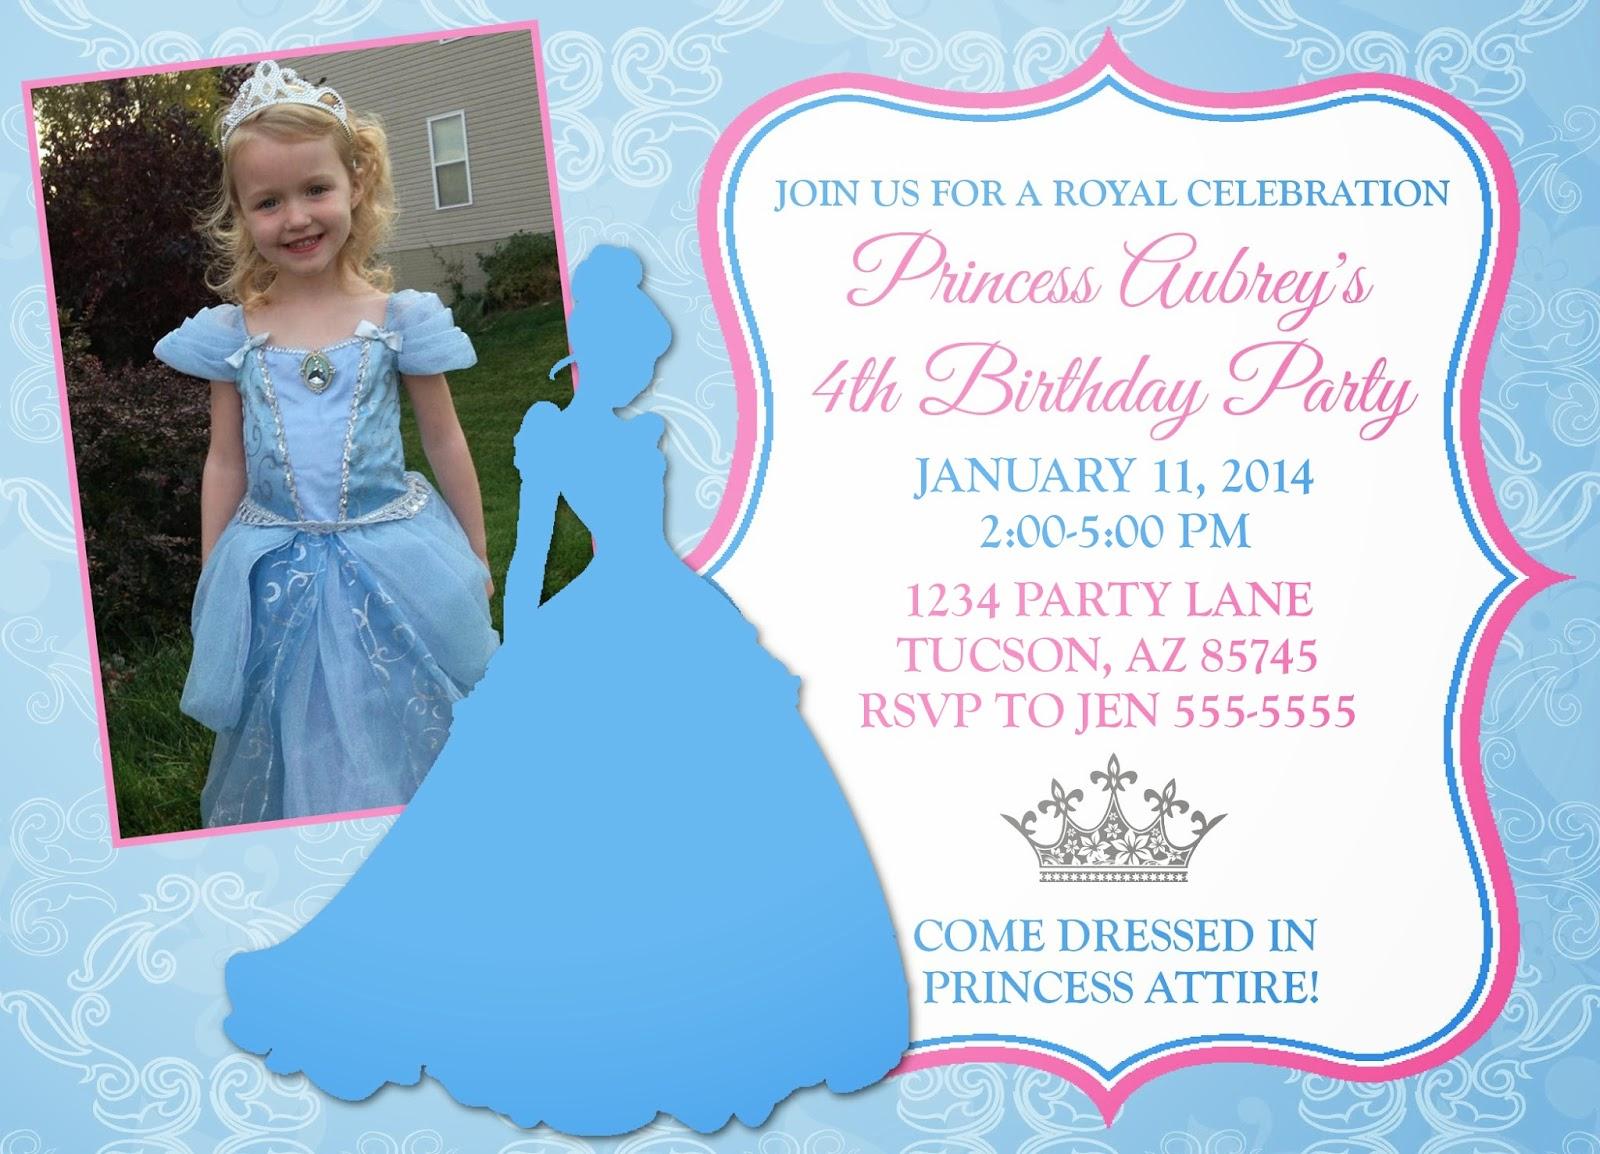 Cinderella birthday invitations kubreforic cinderella birthday invitations filmwisefo